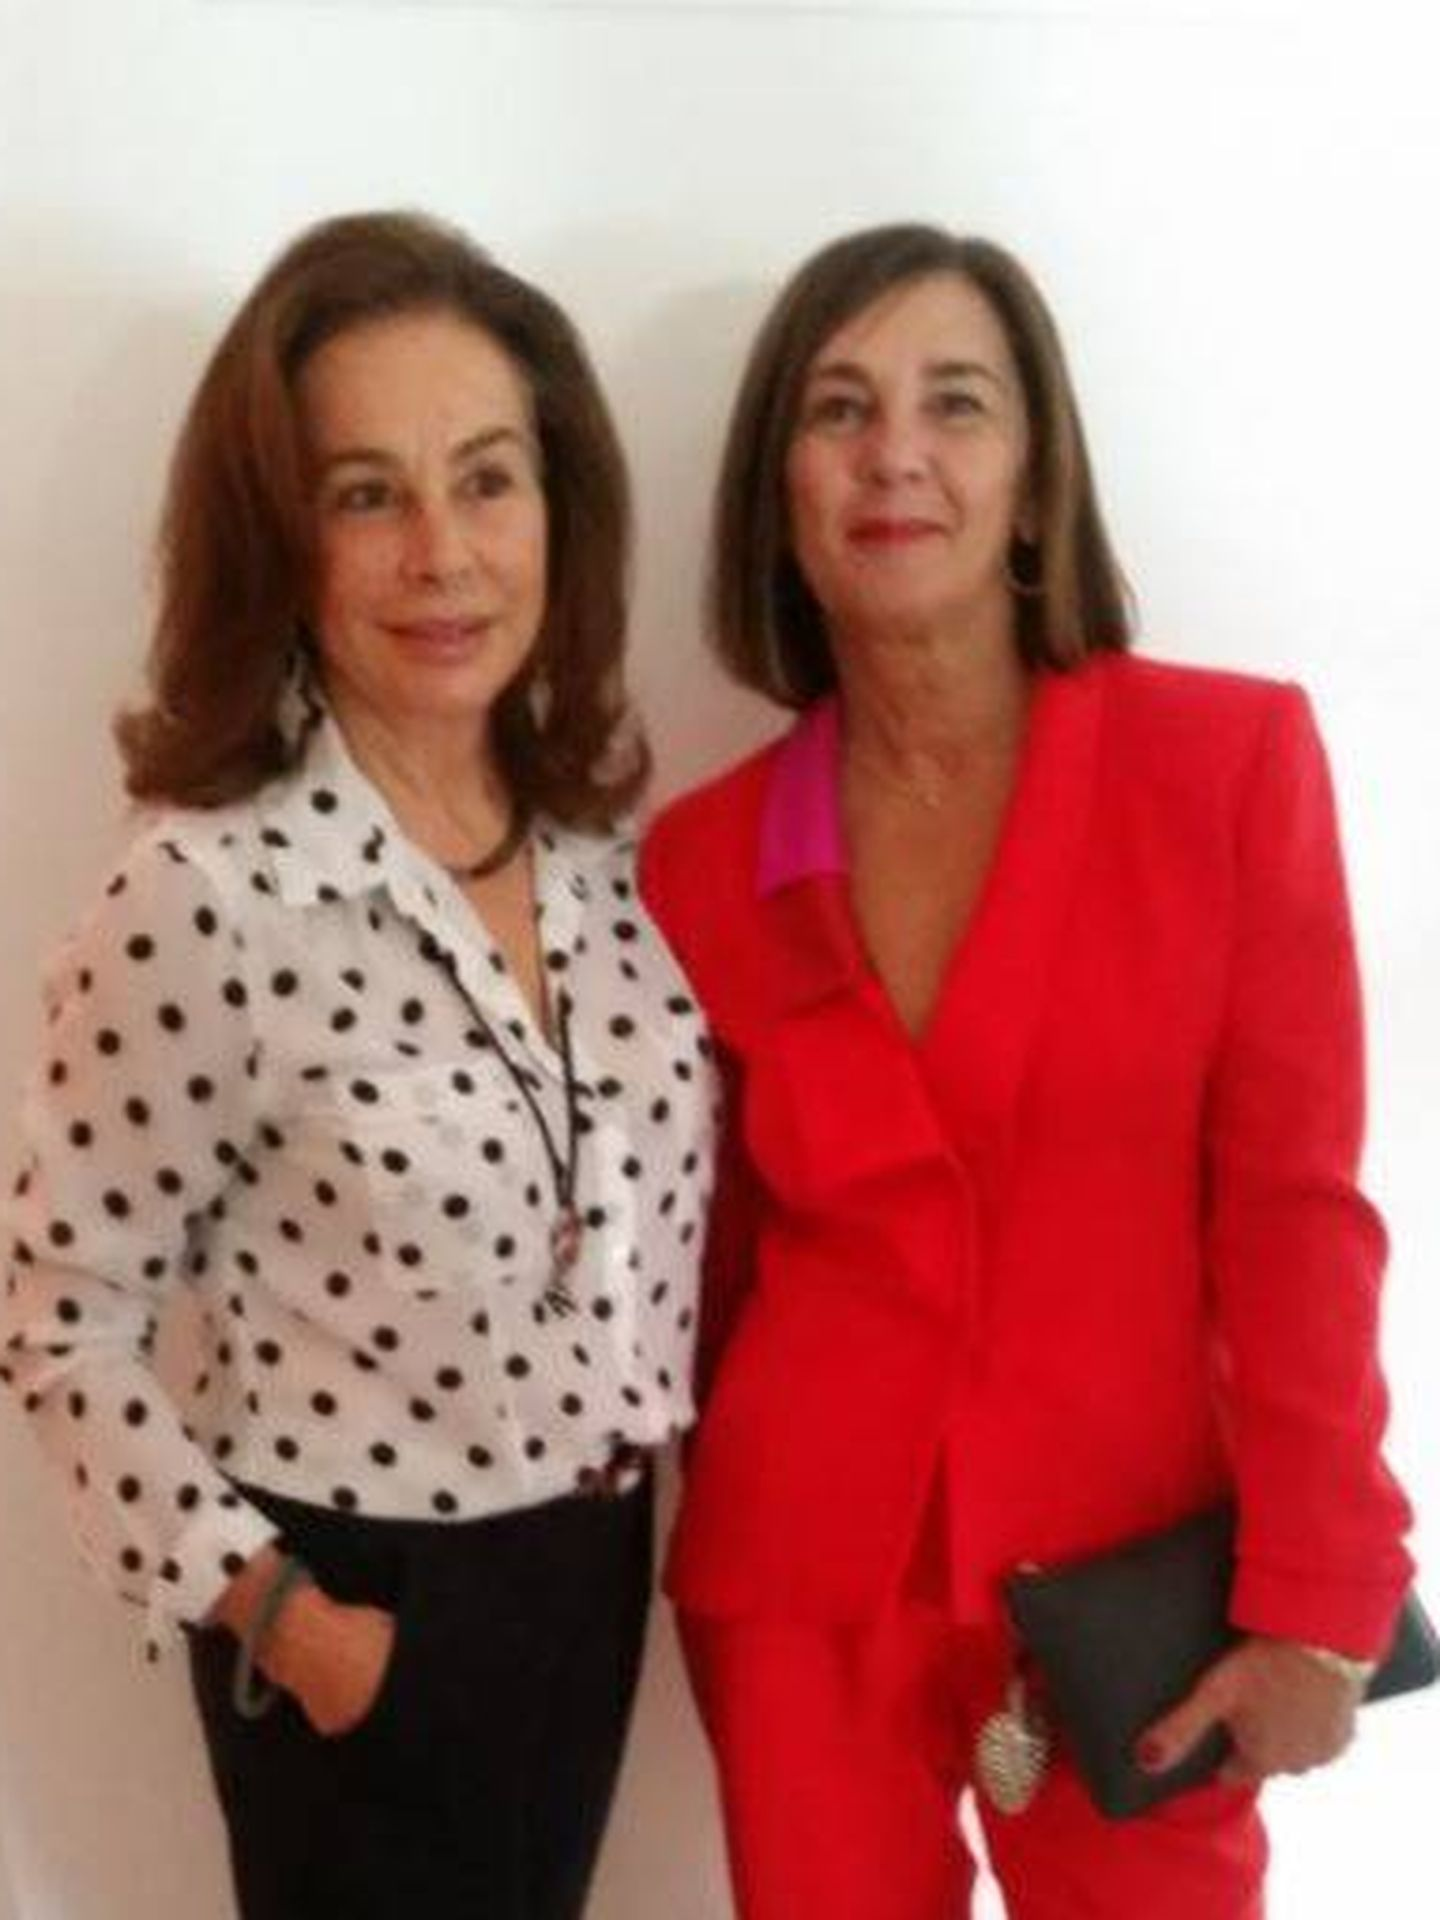 Charo Izquierdo y Natalia Escalada. (Vanitatis)